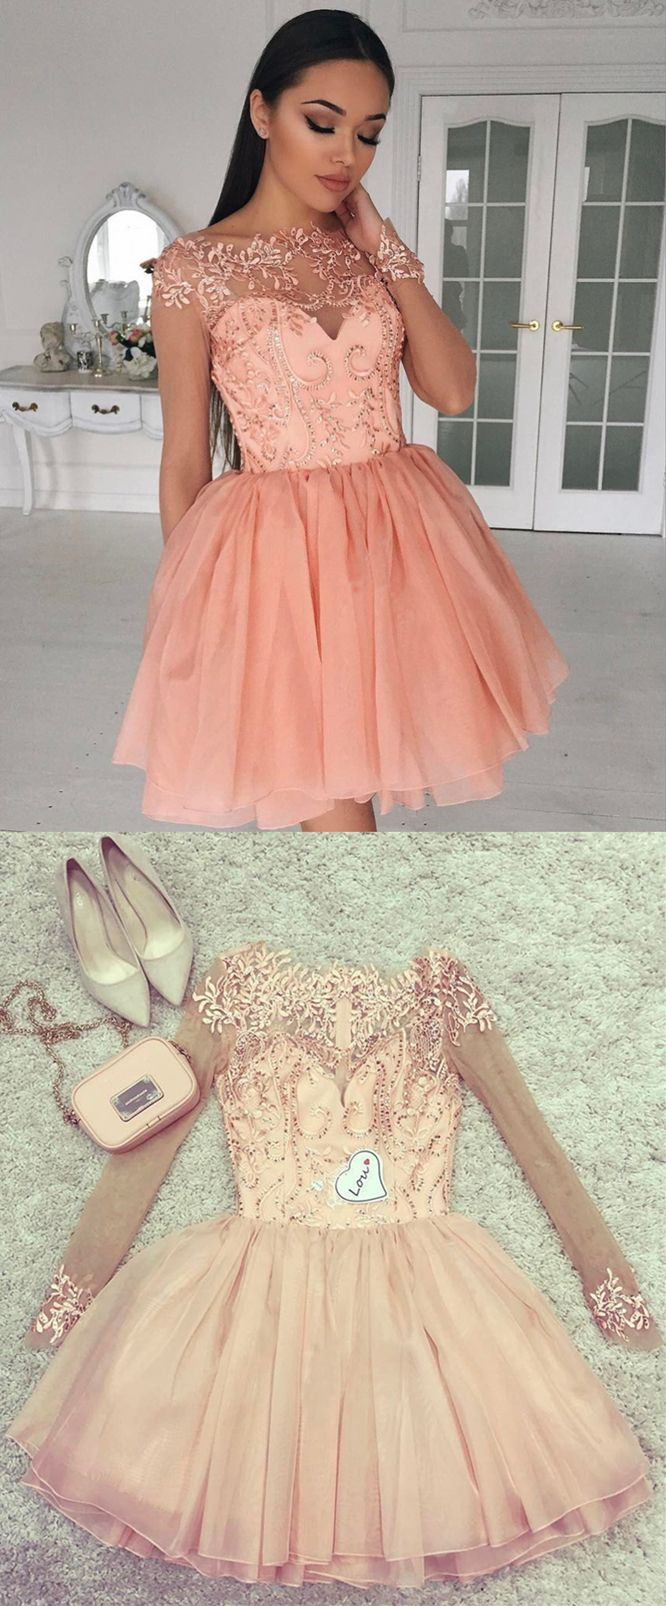 homecoming dresseslong sleeve homecoming dressestule